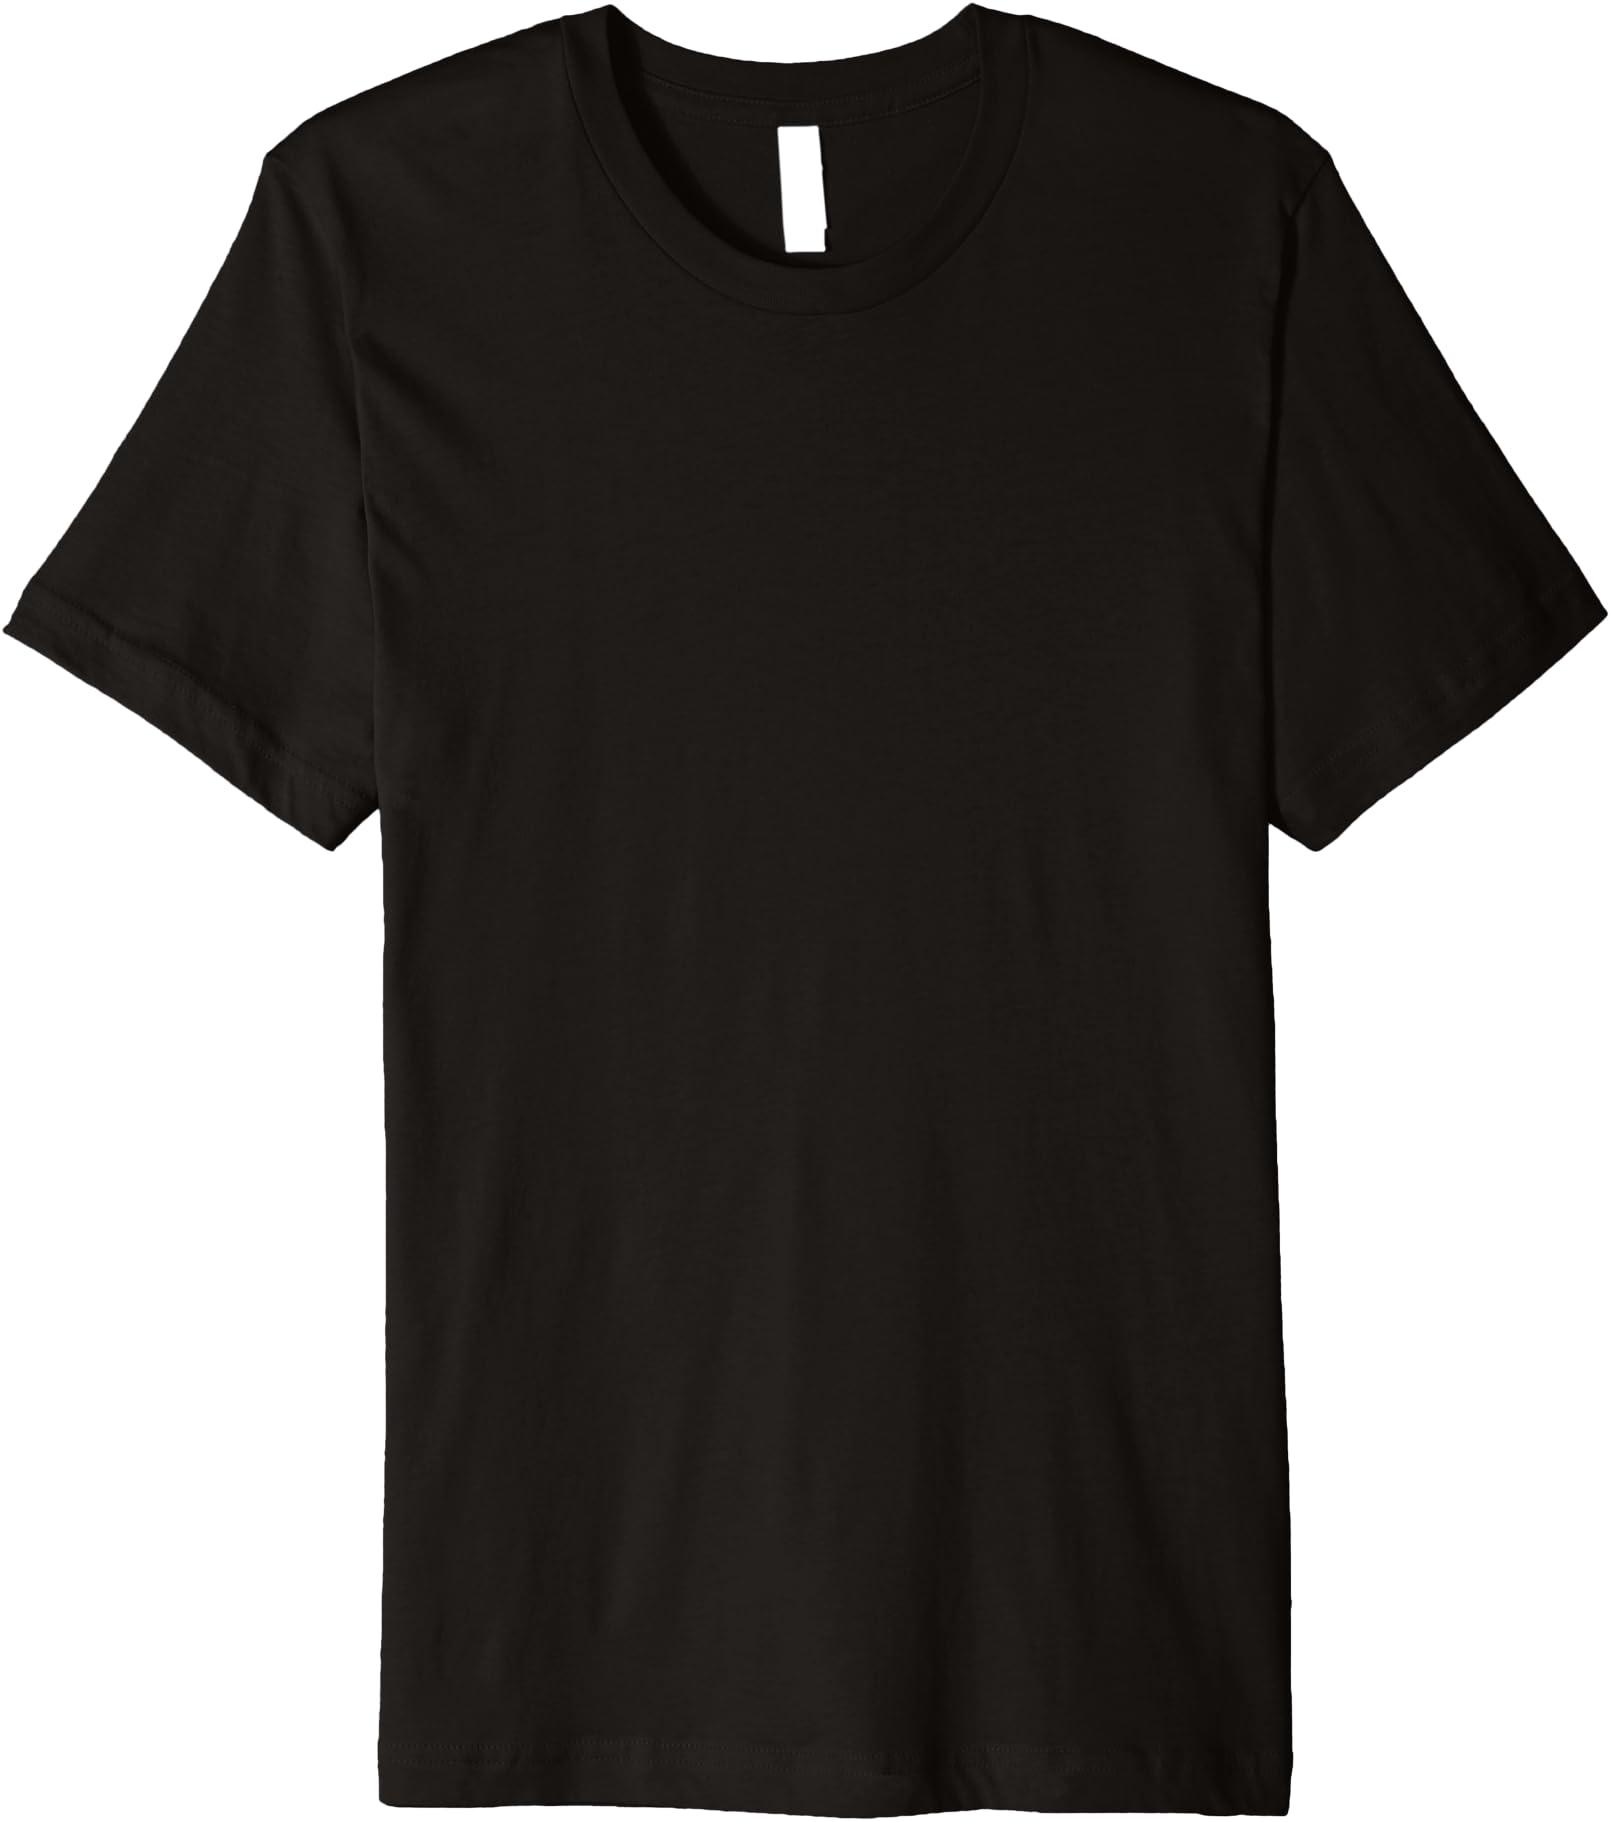 Deep Ocean Bluefin Tuna Fish Toddler /& Kids Boys Girls Tee T-Shirt Gift Shirts